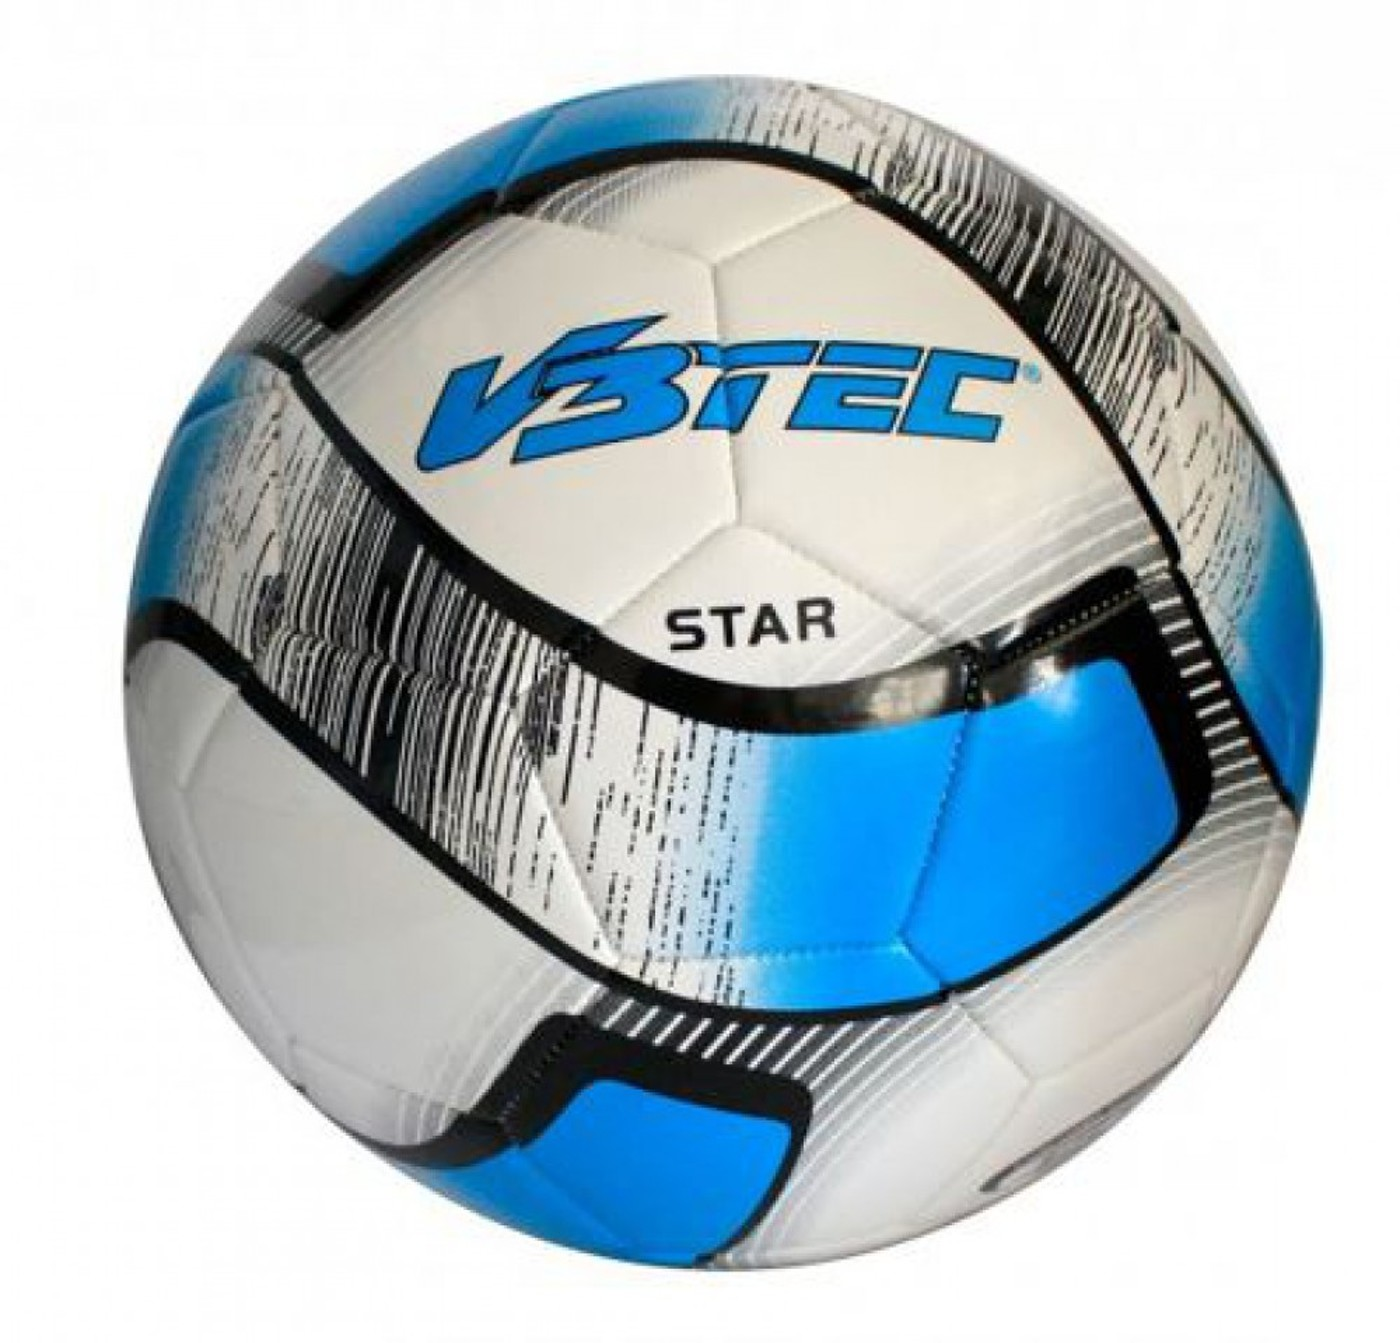 V3TEC STAR MINI 3.0